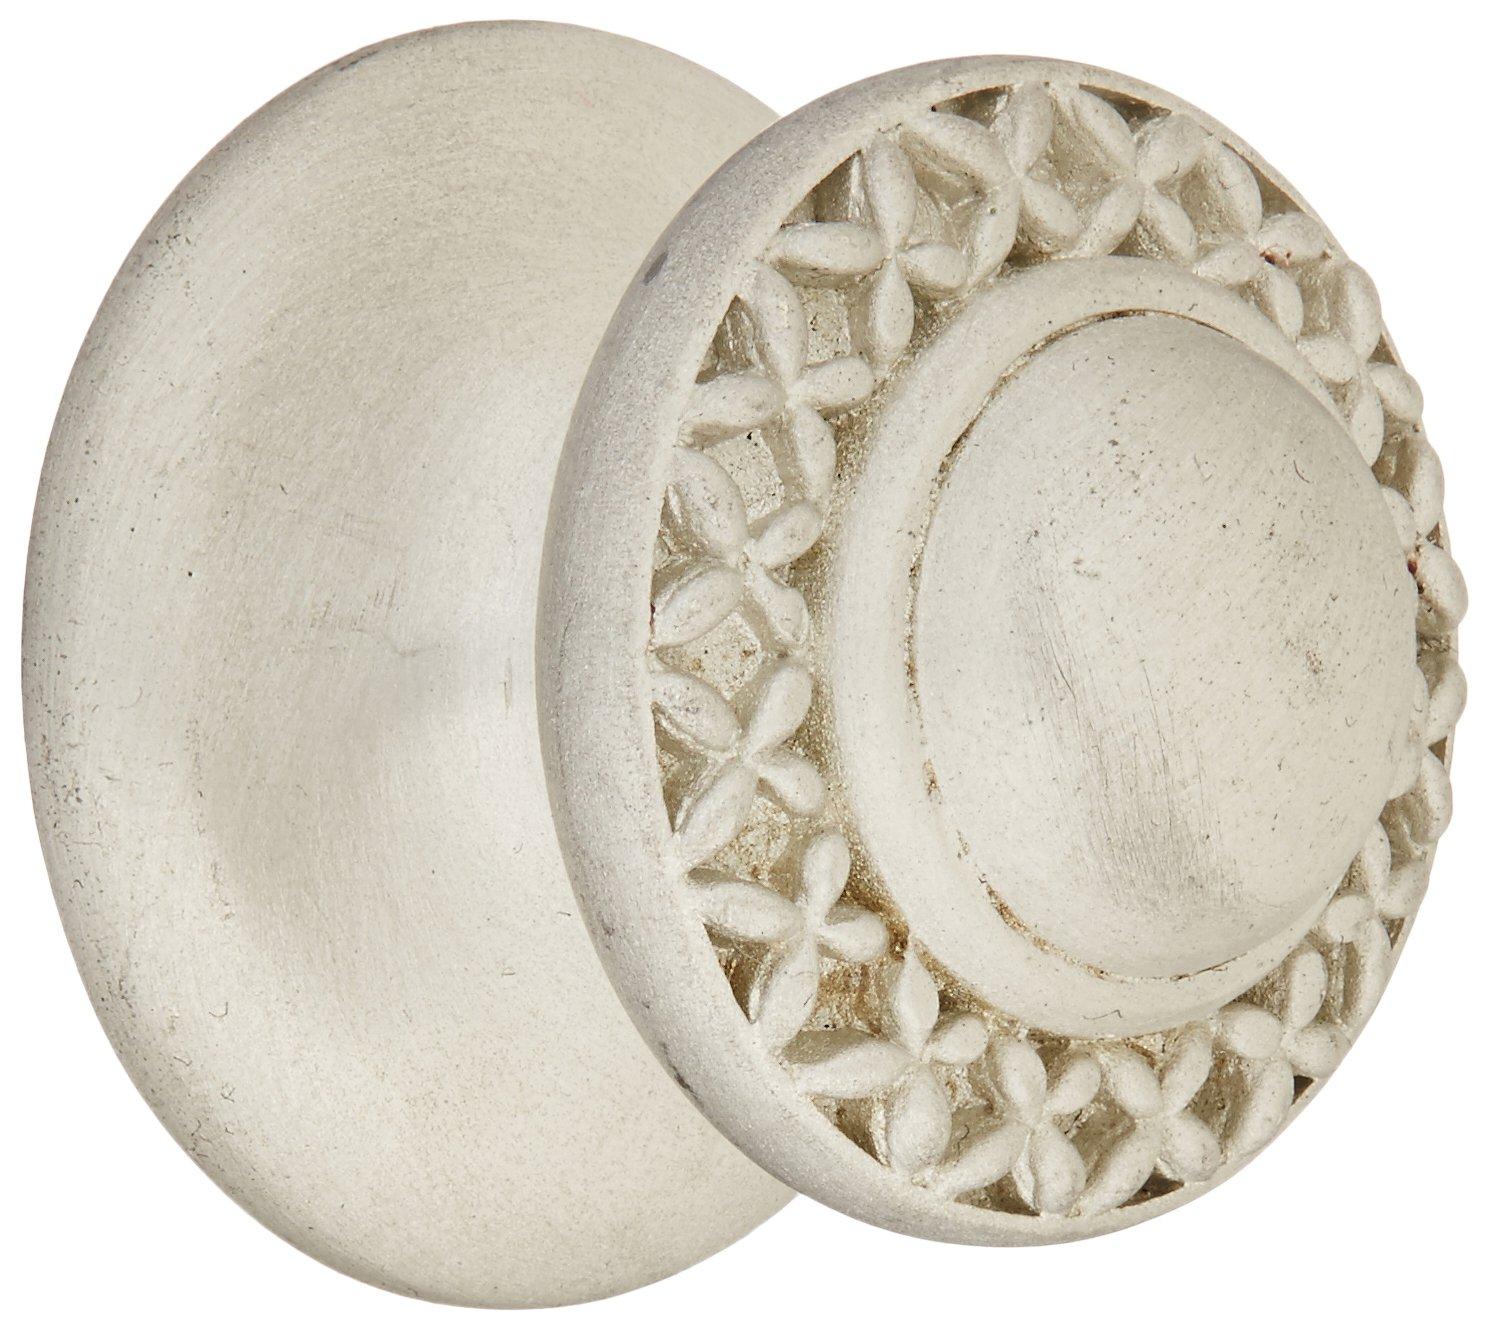 Vicenza Designs K1150-PEWT-SN Gioiello Kisses Knob Small Satin Nickel